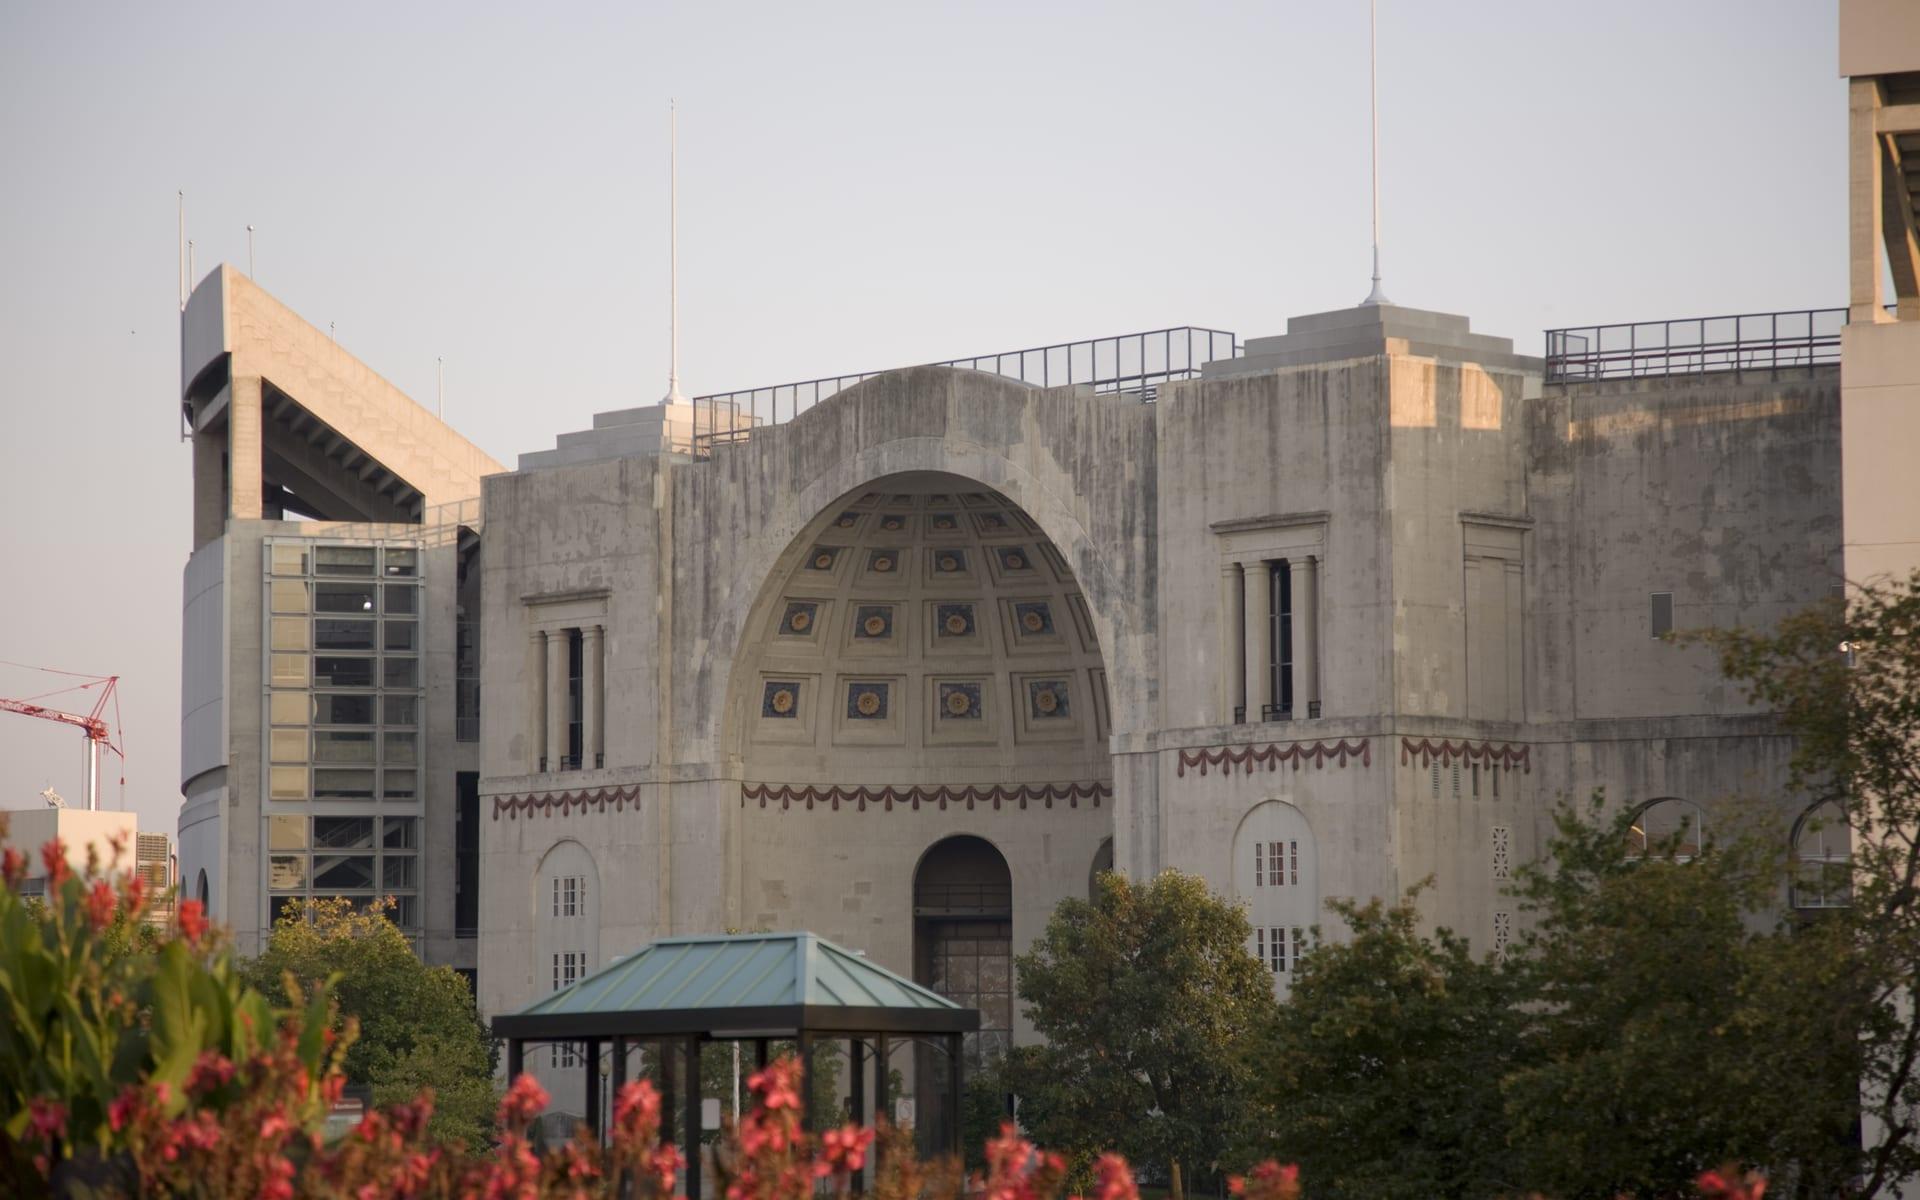 Website: The Ohio State University